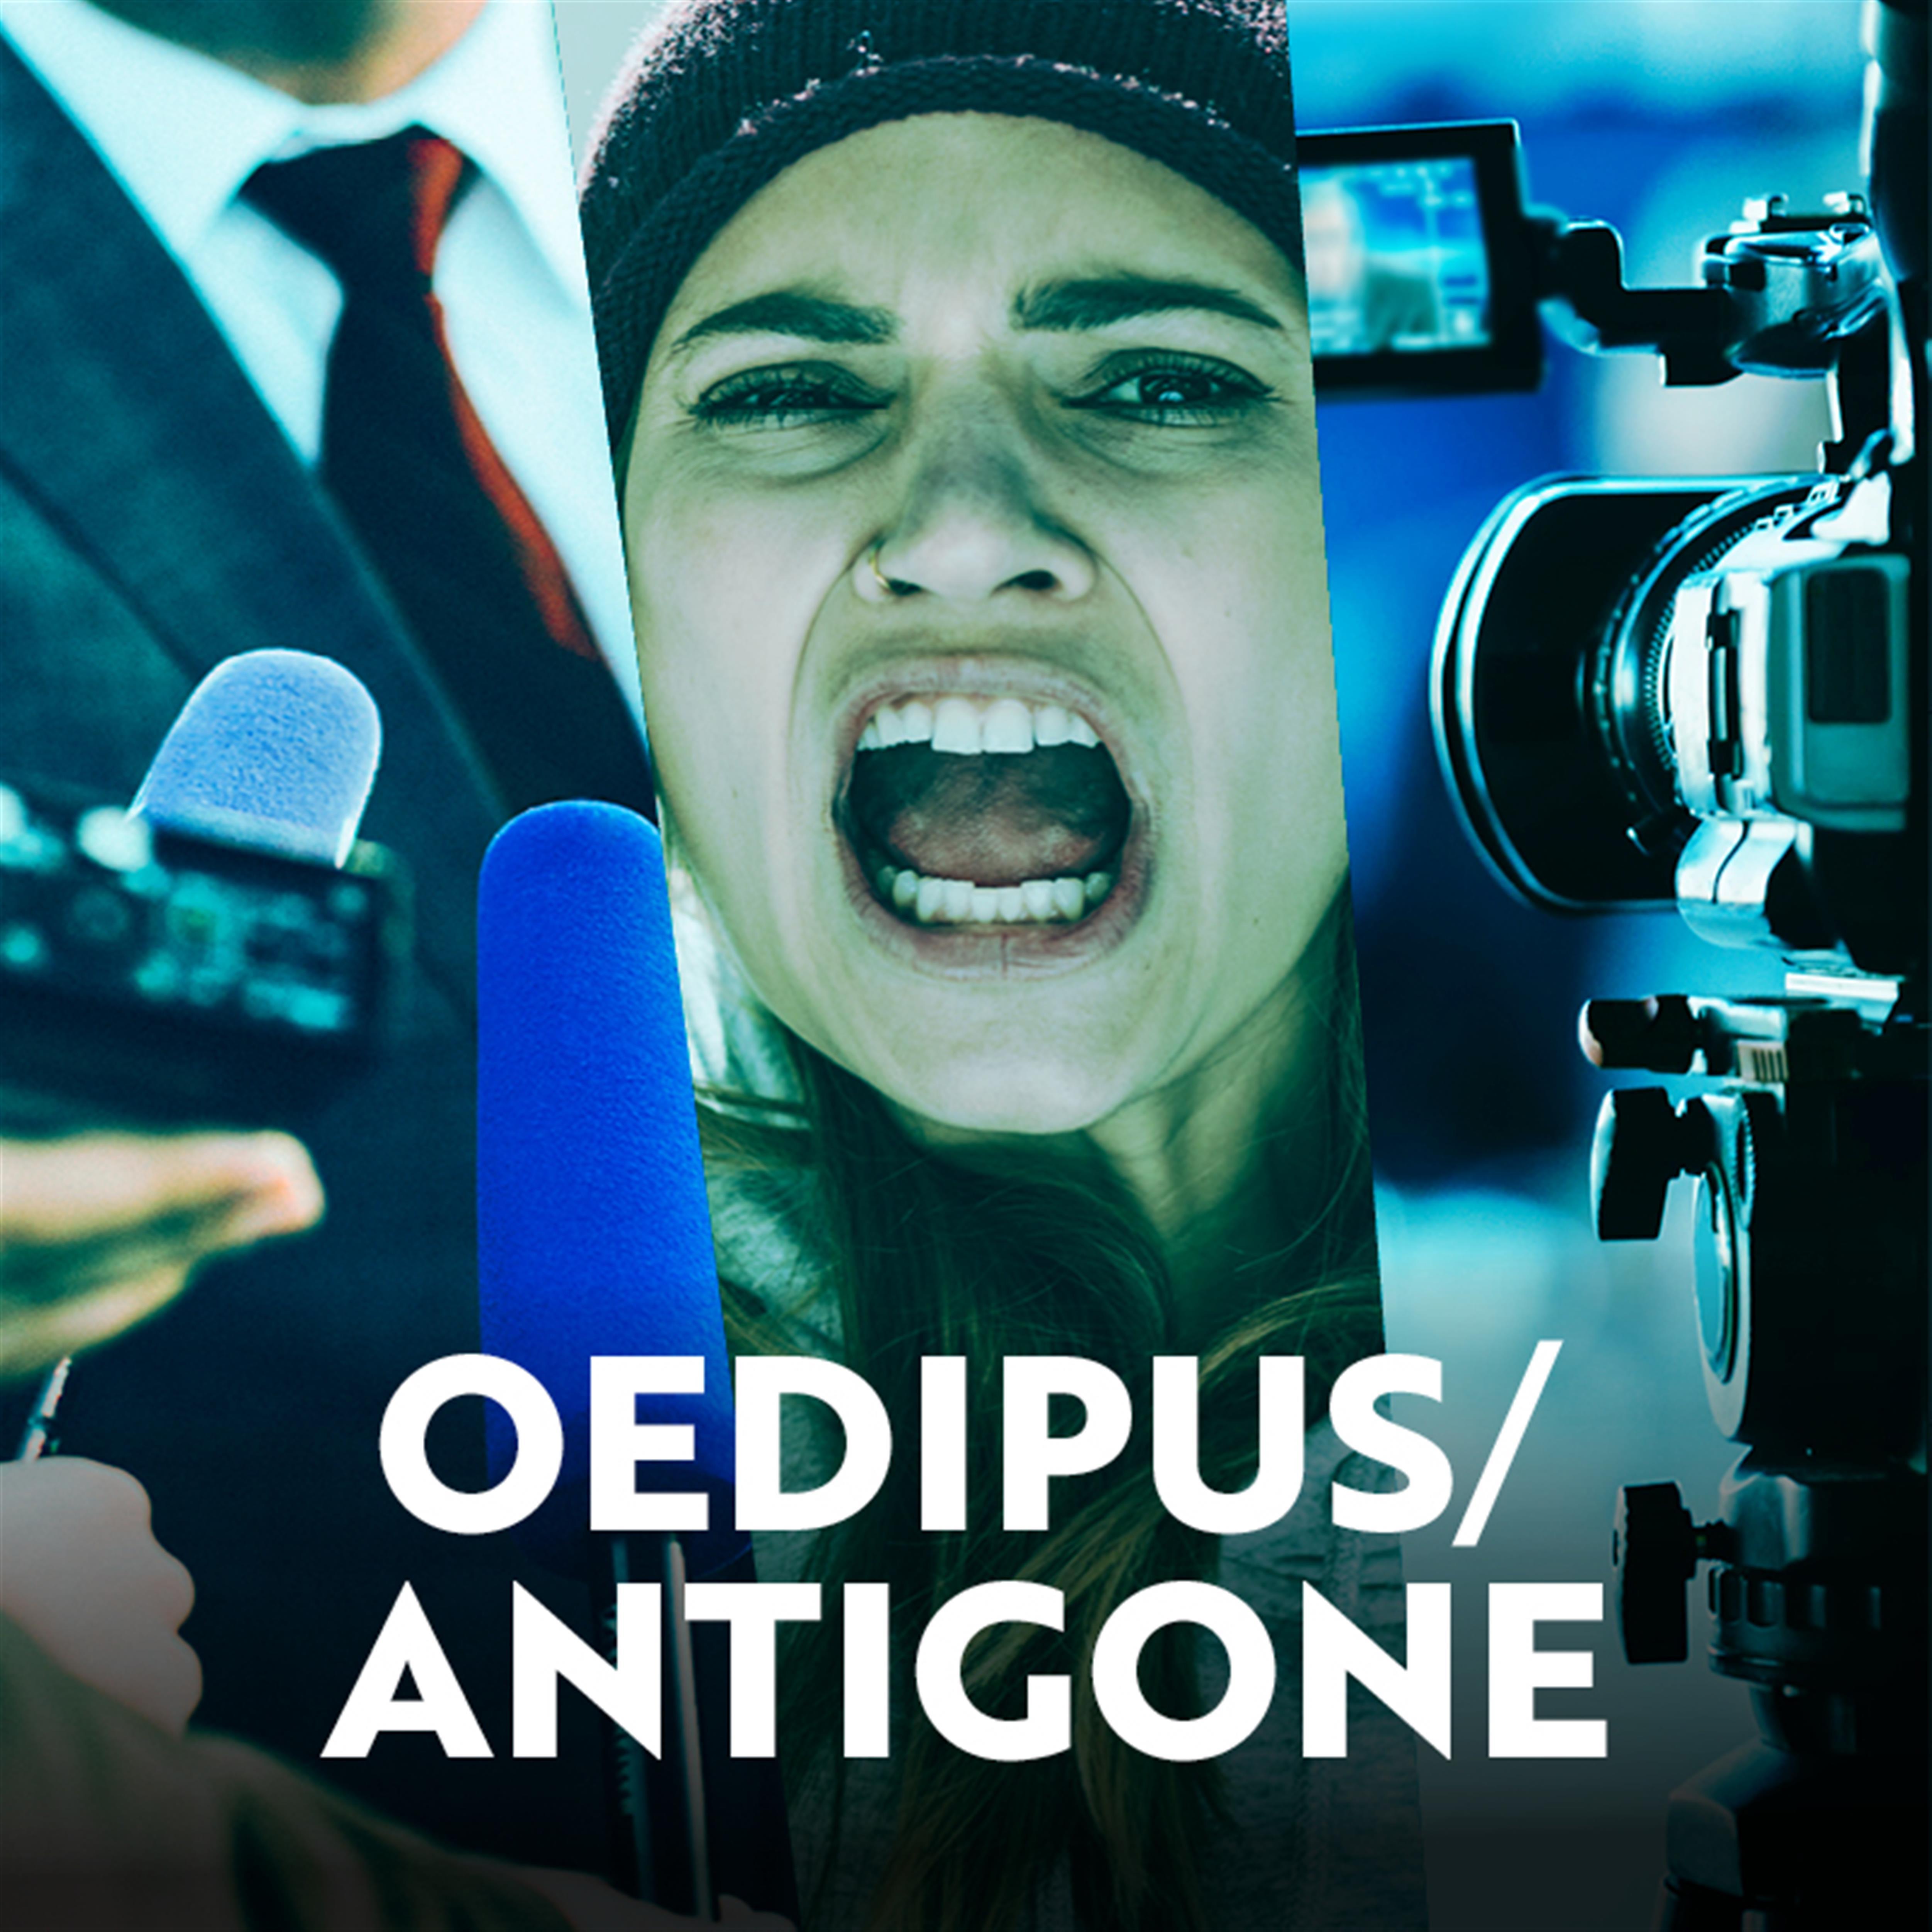 Oedipus/Antigone (BA Acting)